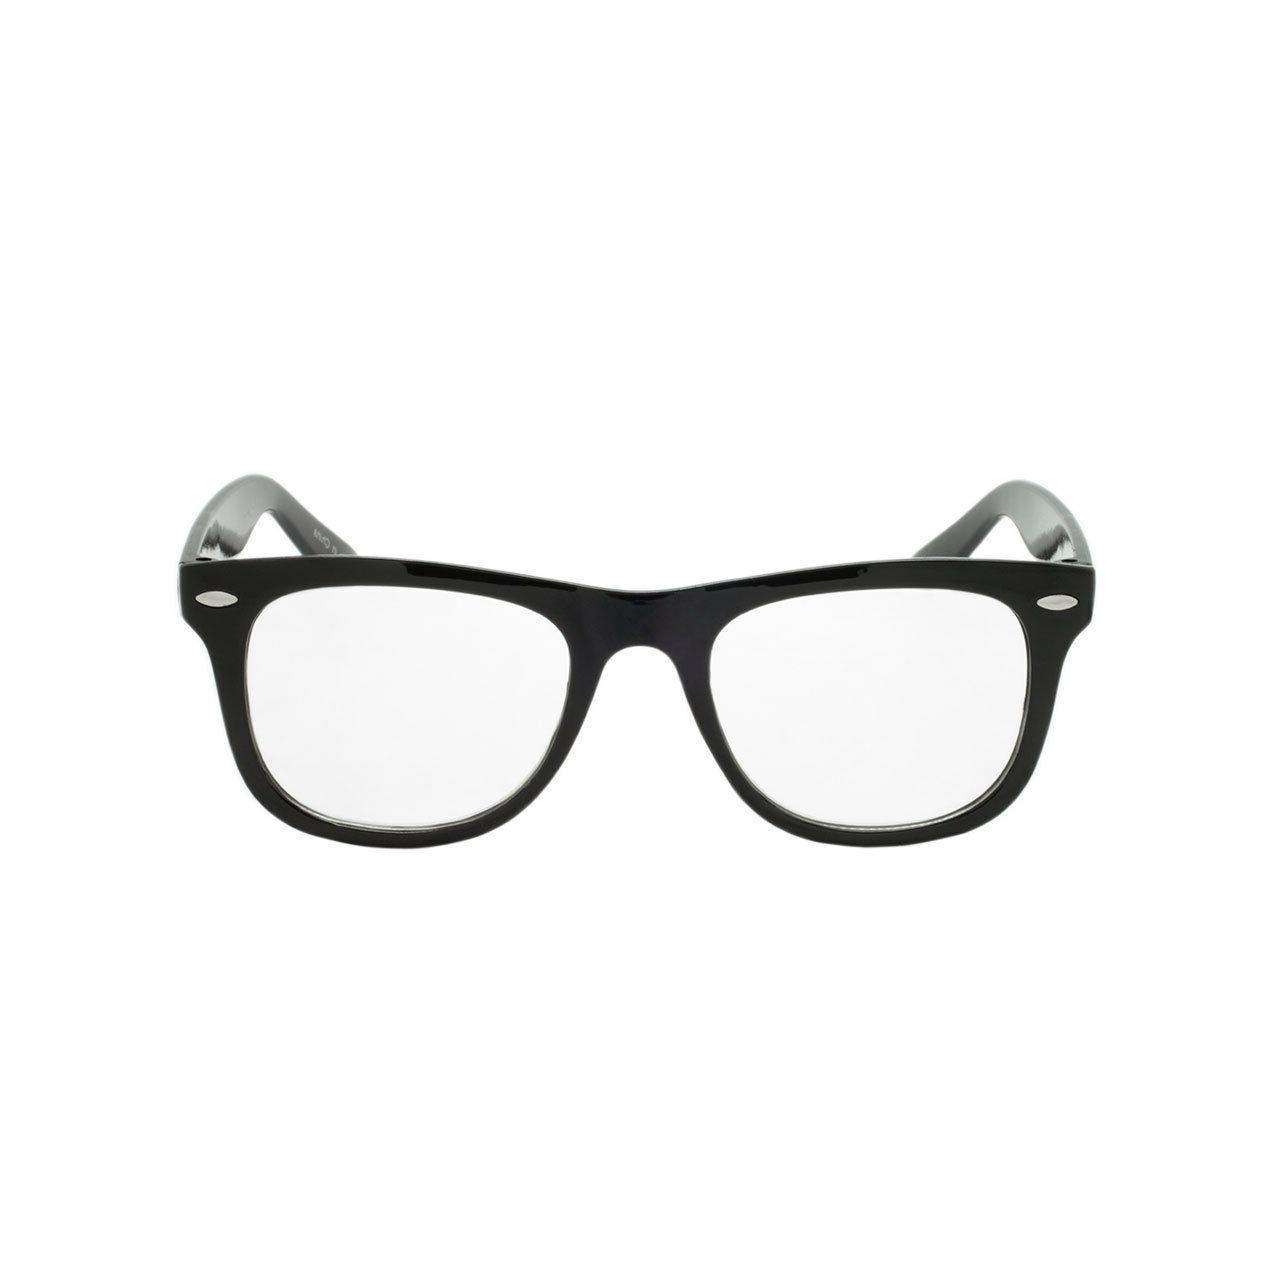 Mens Glasses 4 Unisex Retro Style Readers Power